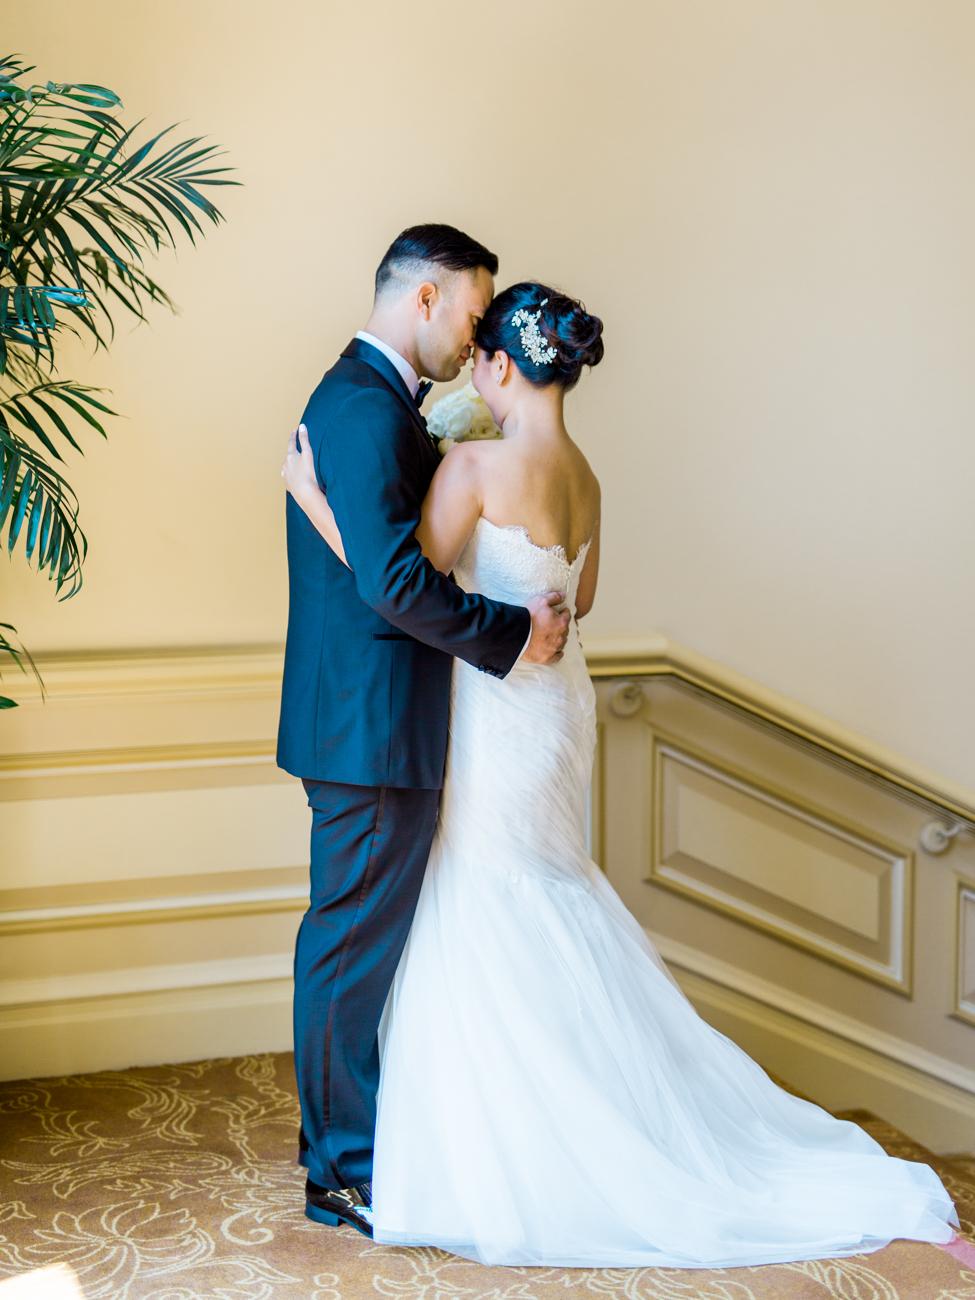 DennisRoyCoronel_pasadena_langham_wedding-26.jpg